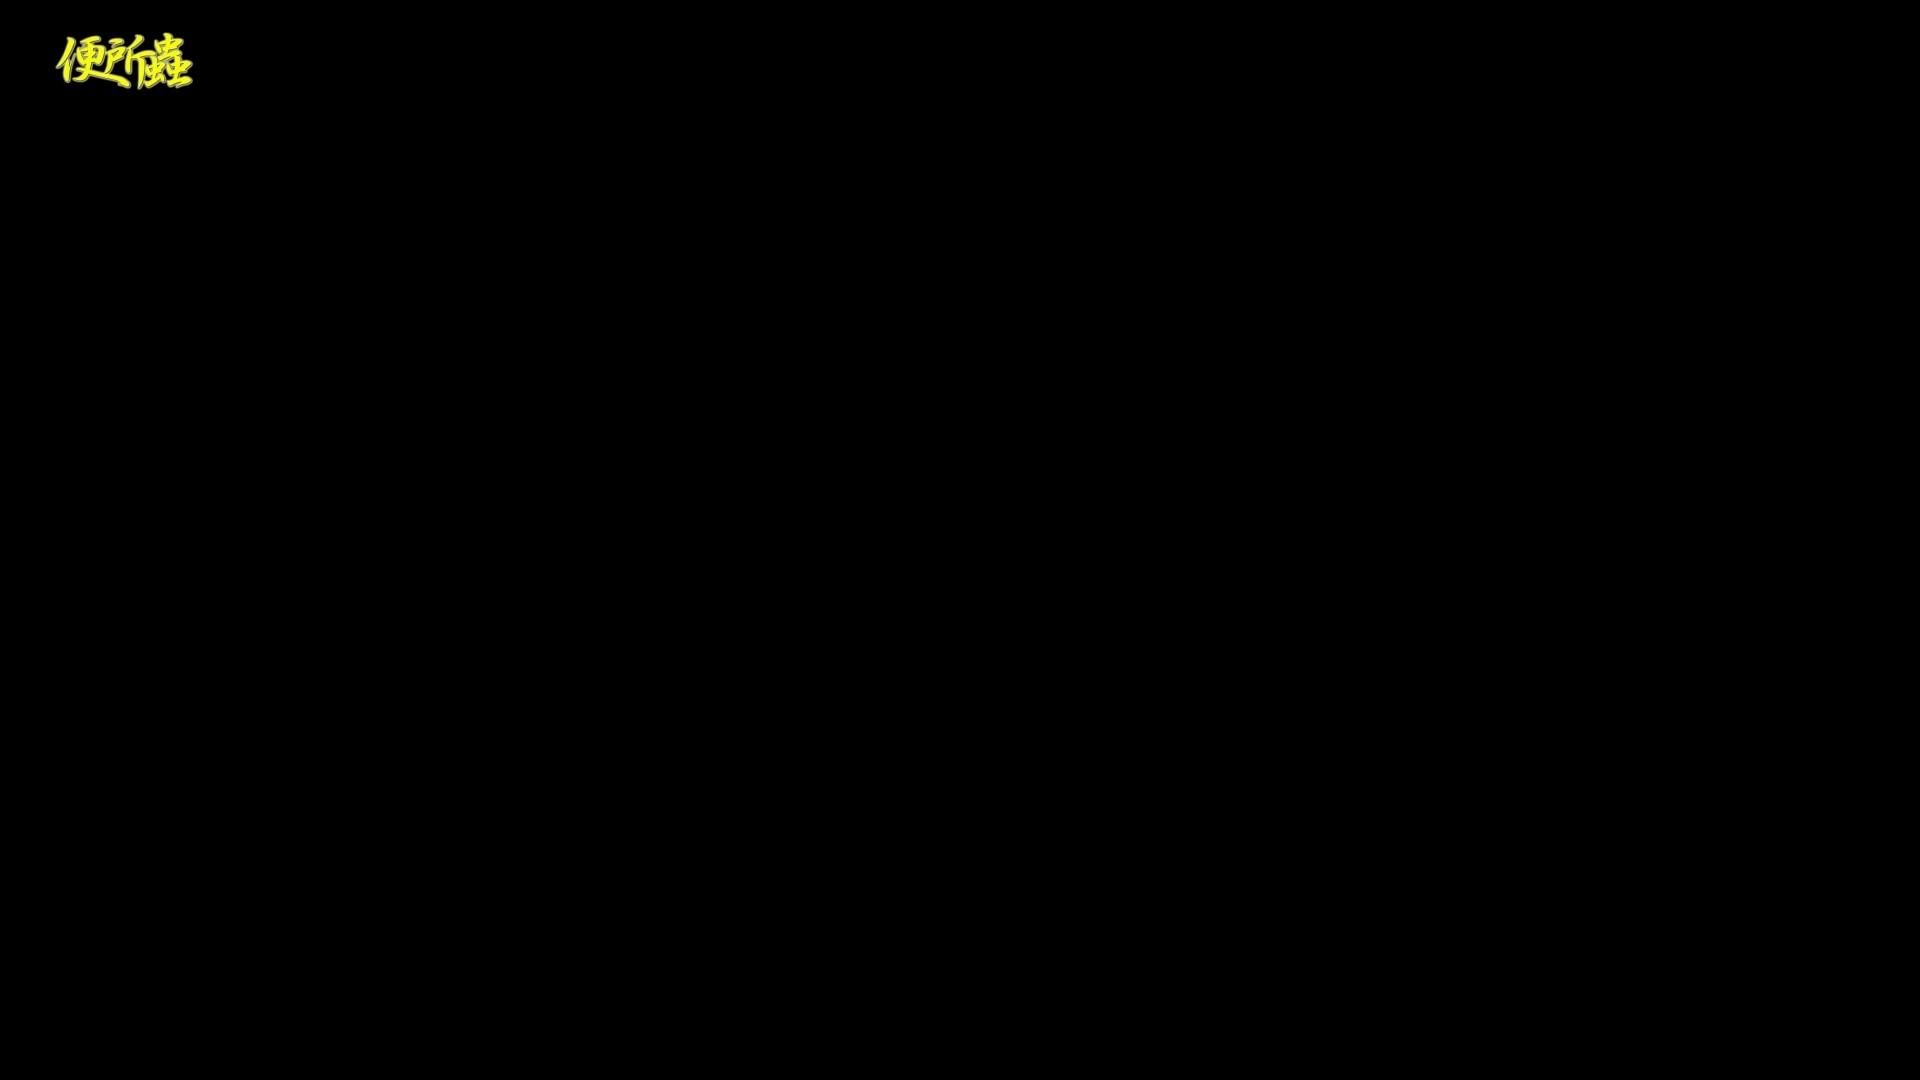 vol.08 便所蟲さんのリターン~寺子屋洗面所盗撮~ 盗撮大放出 セックス無修正動画無料 89連発 59